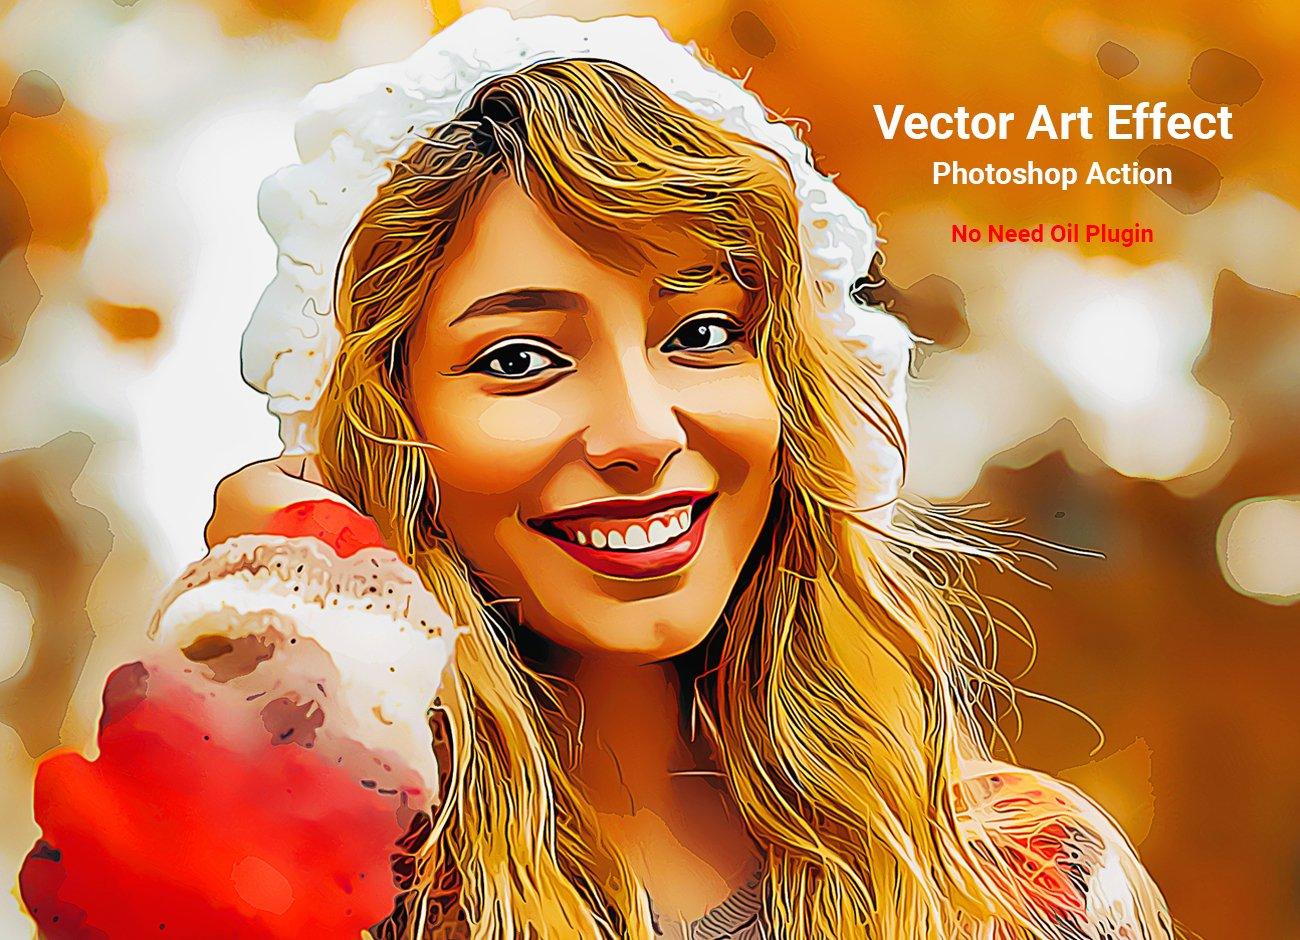 油画绘画效果照片处理特效PS动作模板 Vector Art Effect Photoshop Action插图